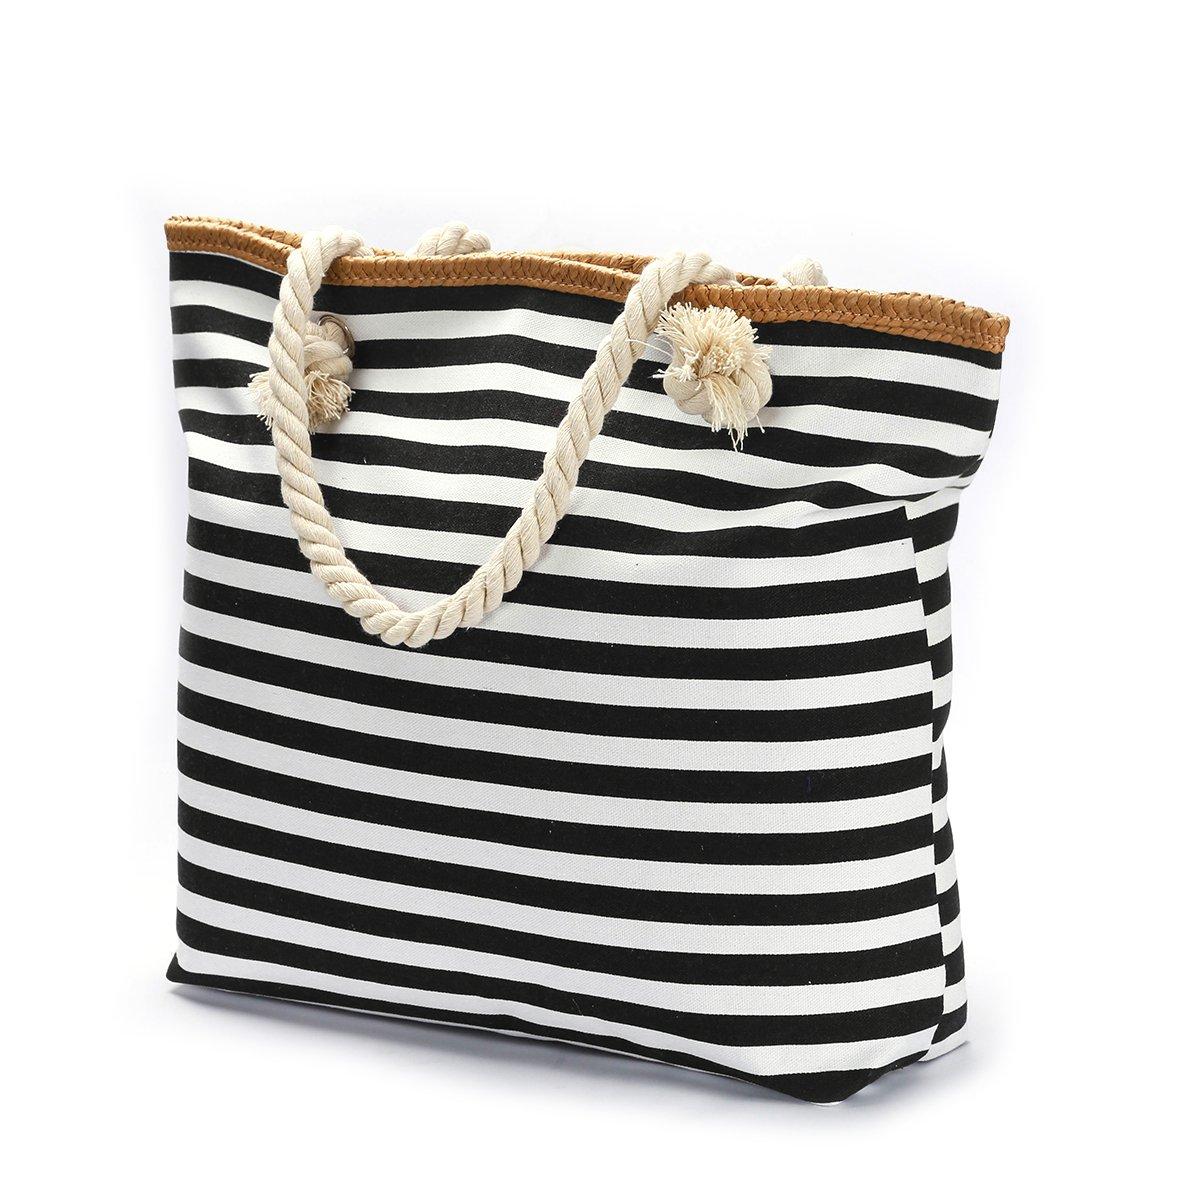 We We Beach Bag Waterproof Canvas Tote Straw Bag - Large (Style 02)